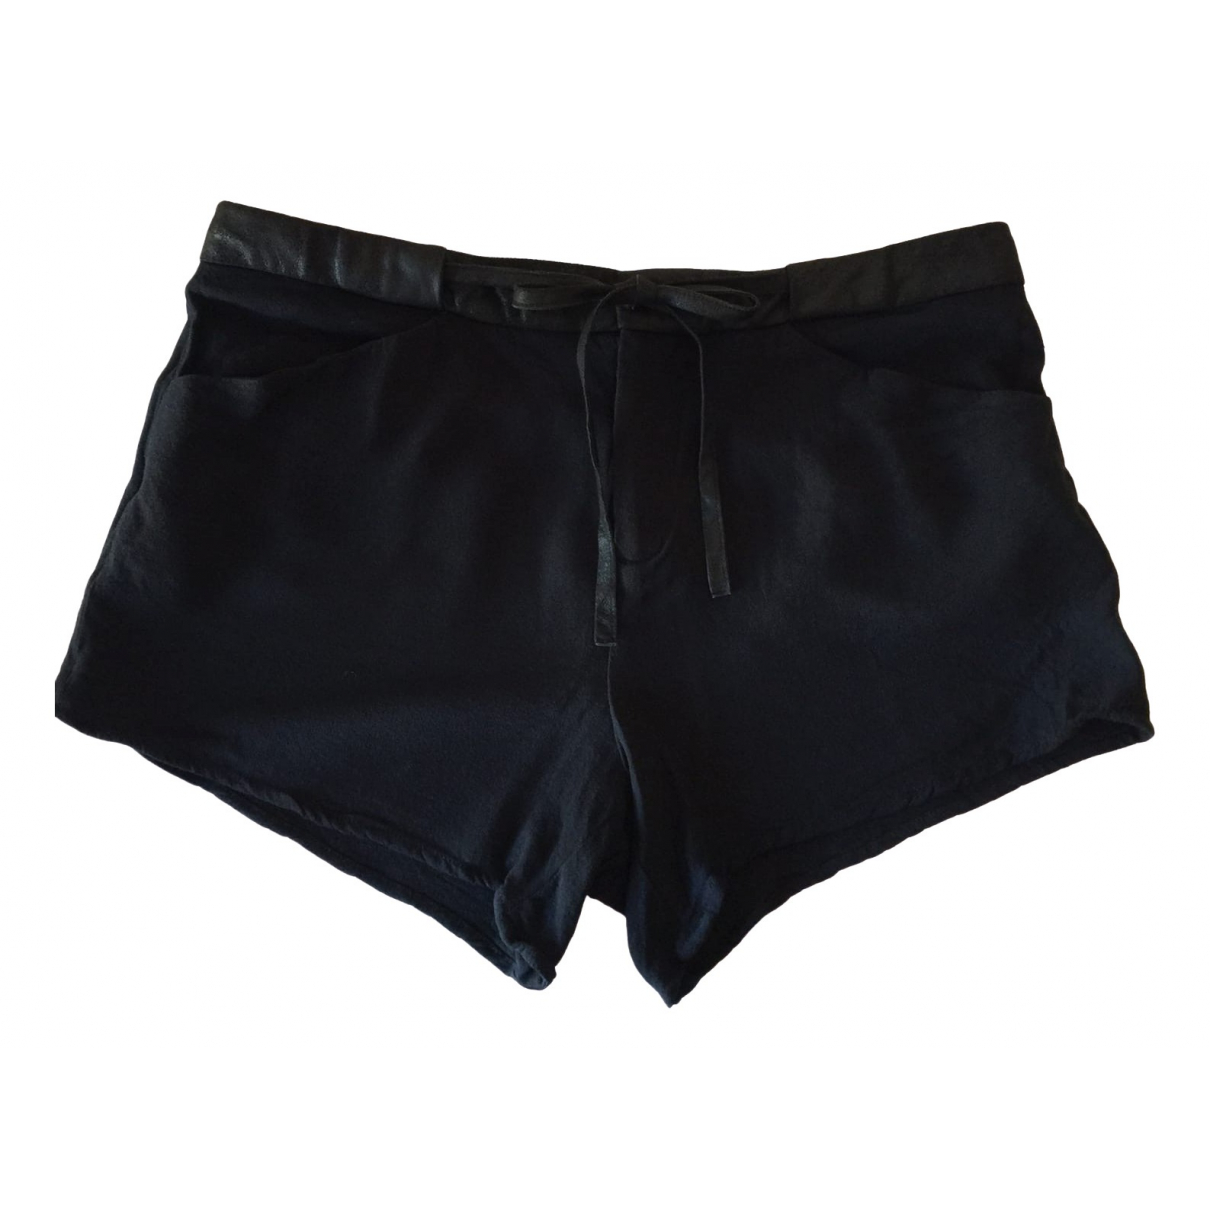 Helmut Lang \N Black Shorts for Women 6 US